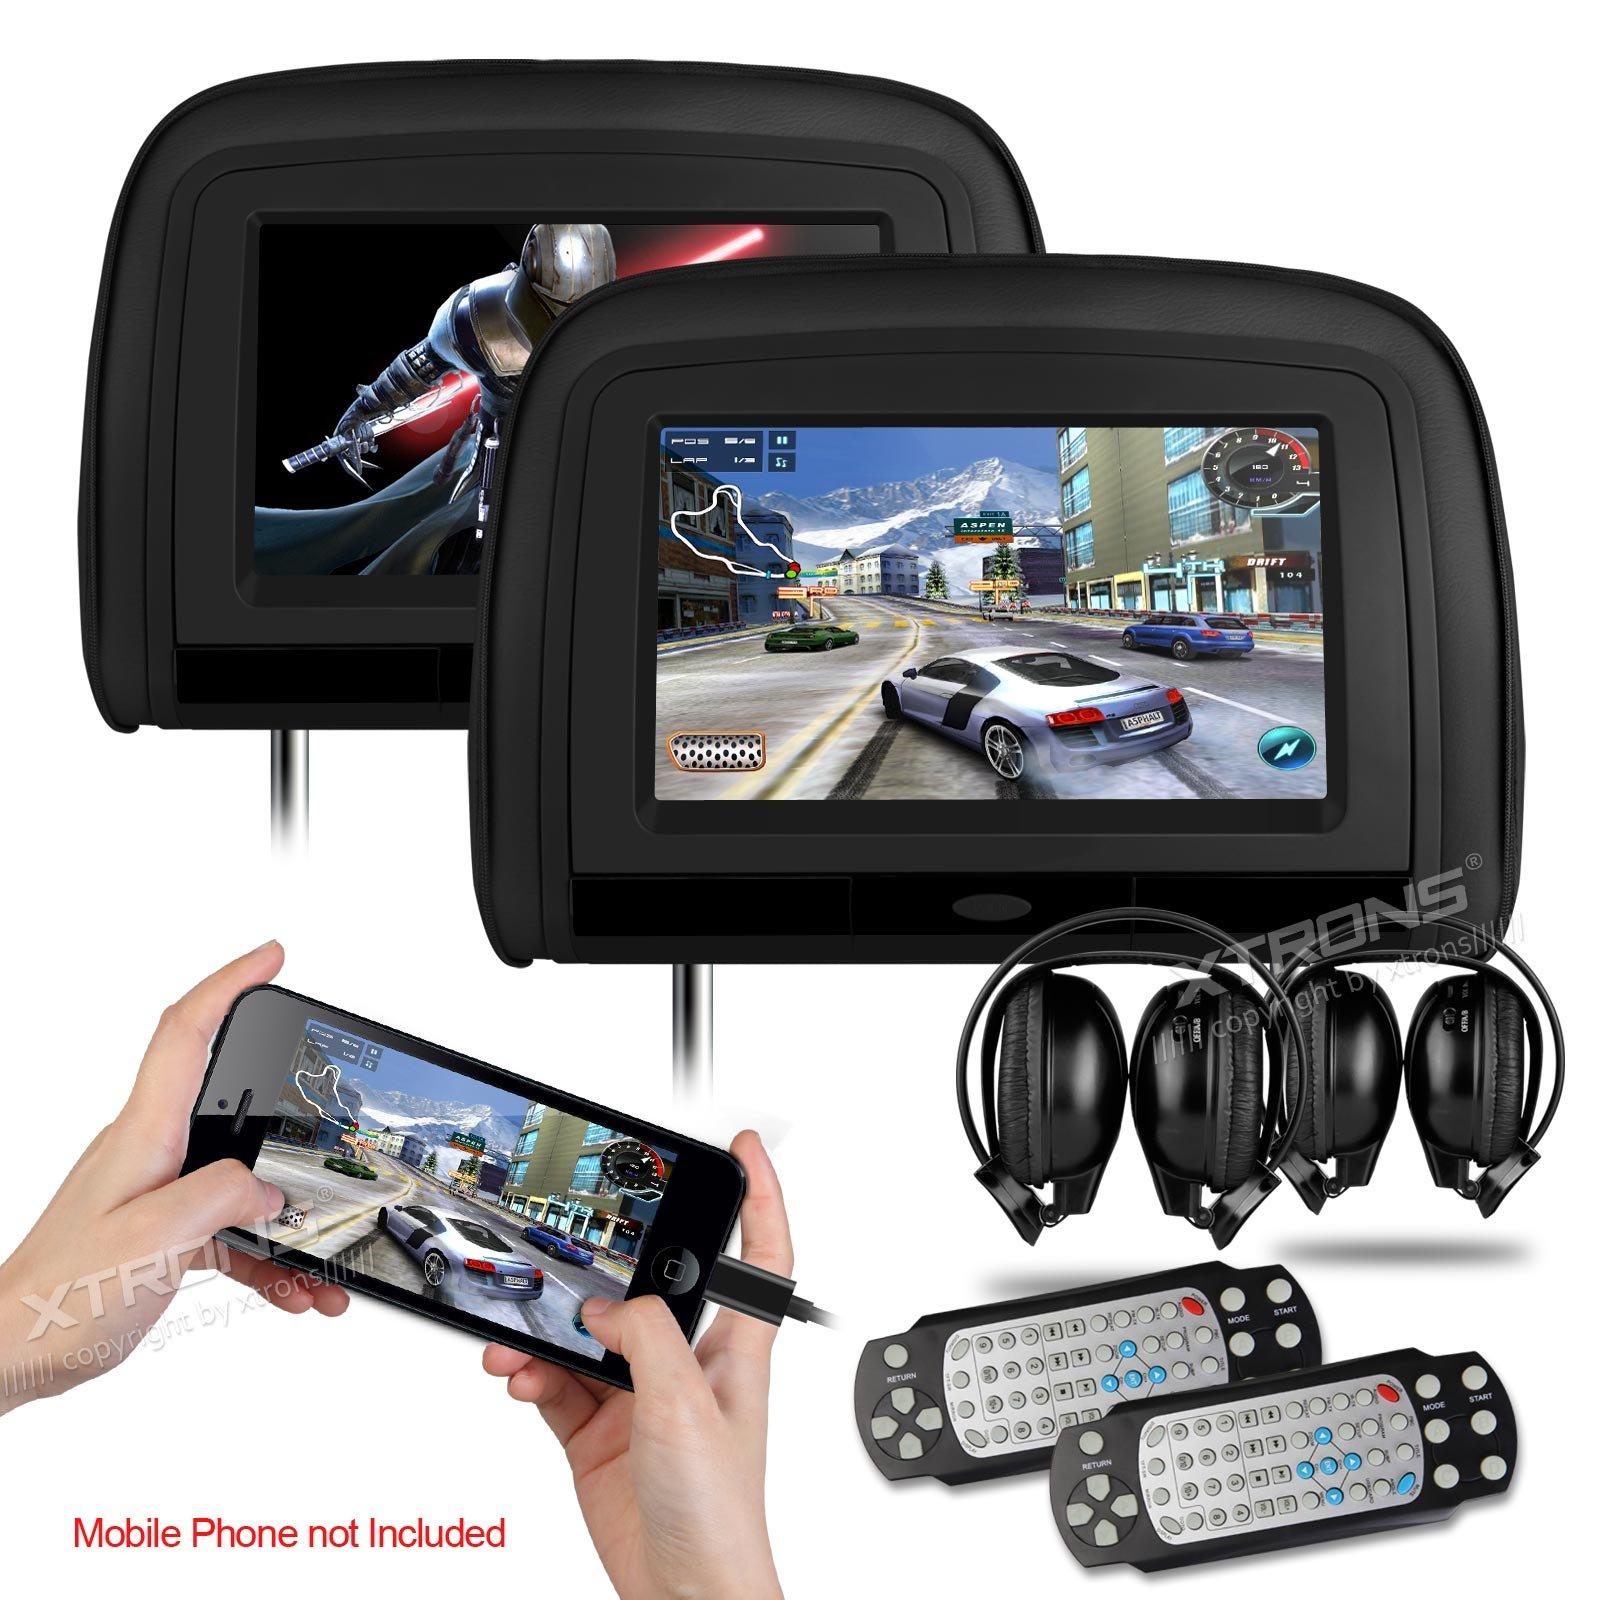 XTRONS Black 29'' HD Digital Widescreen Twin Car Headrest DVD Player 1080P Video with HDMI Input IR transmitter and FM Transmitter&IR Headphones Included